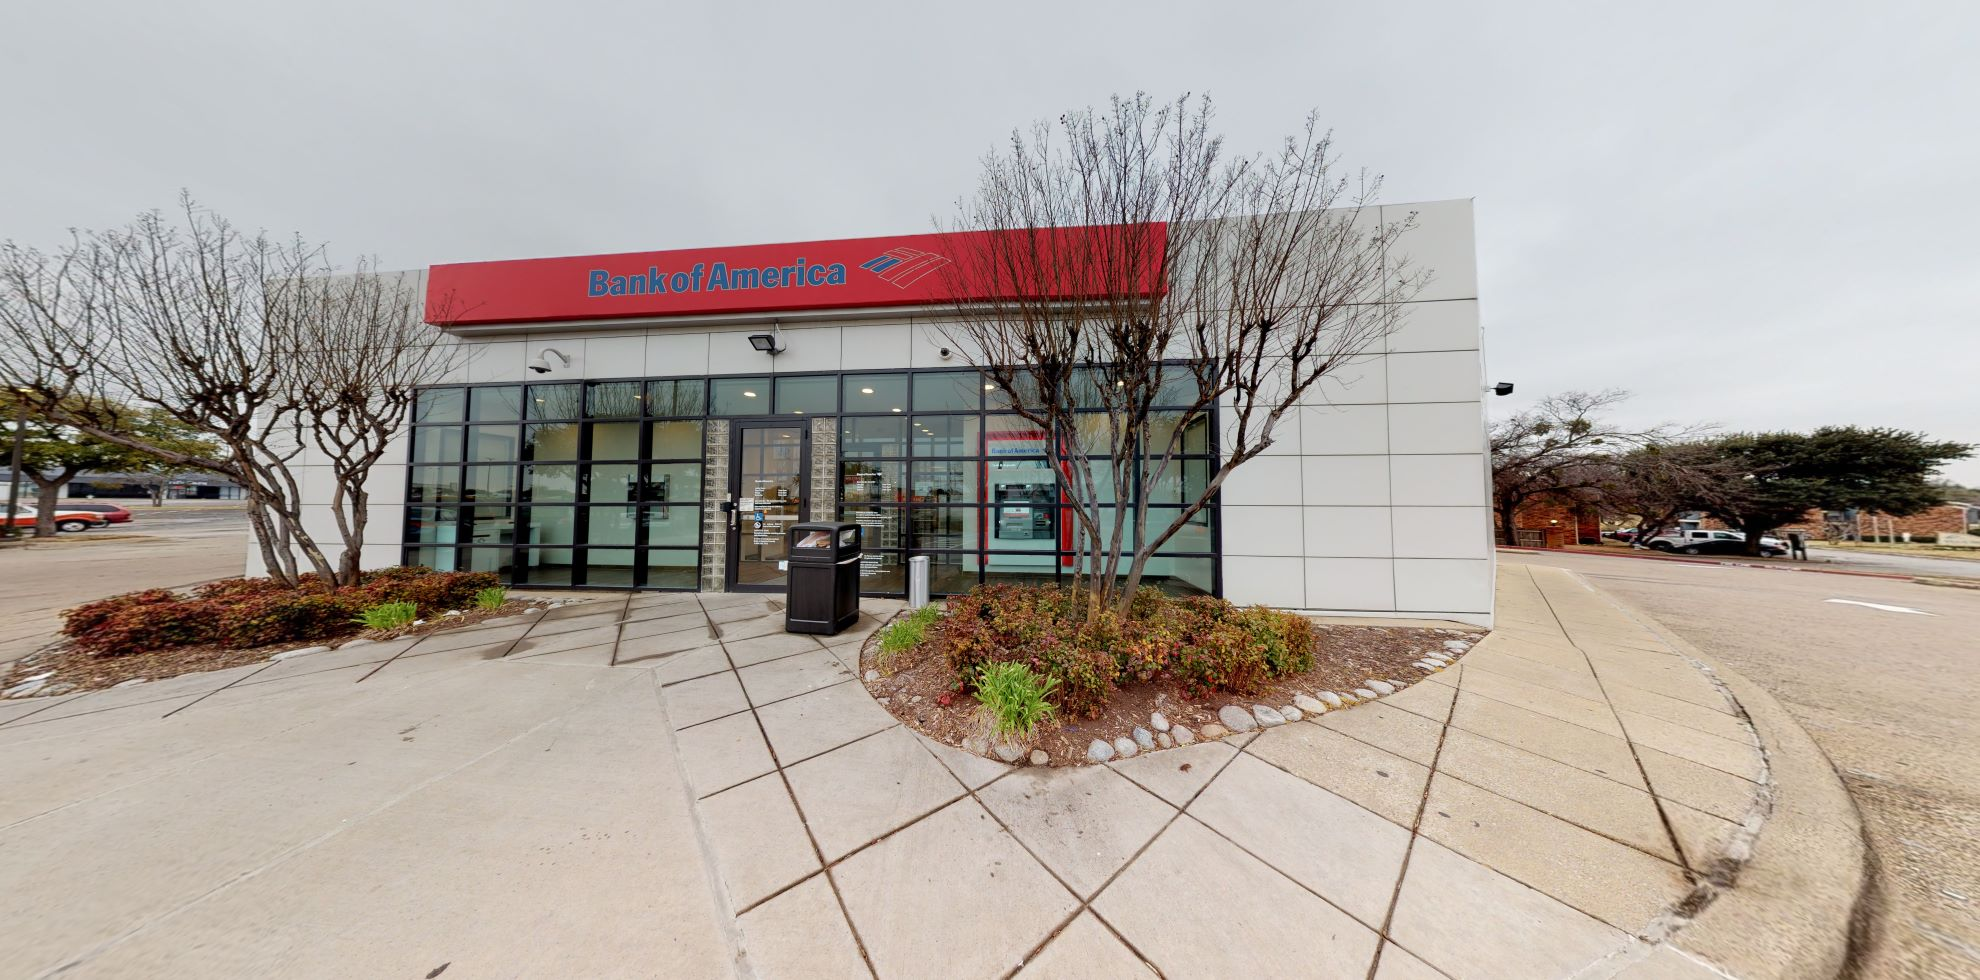 Bank of America financial center with drive-thru ATM | 3028 N Josey Ln, Carrollton, TX 75007